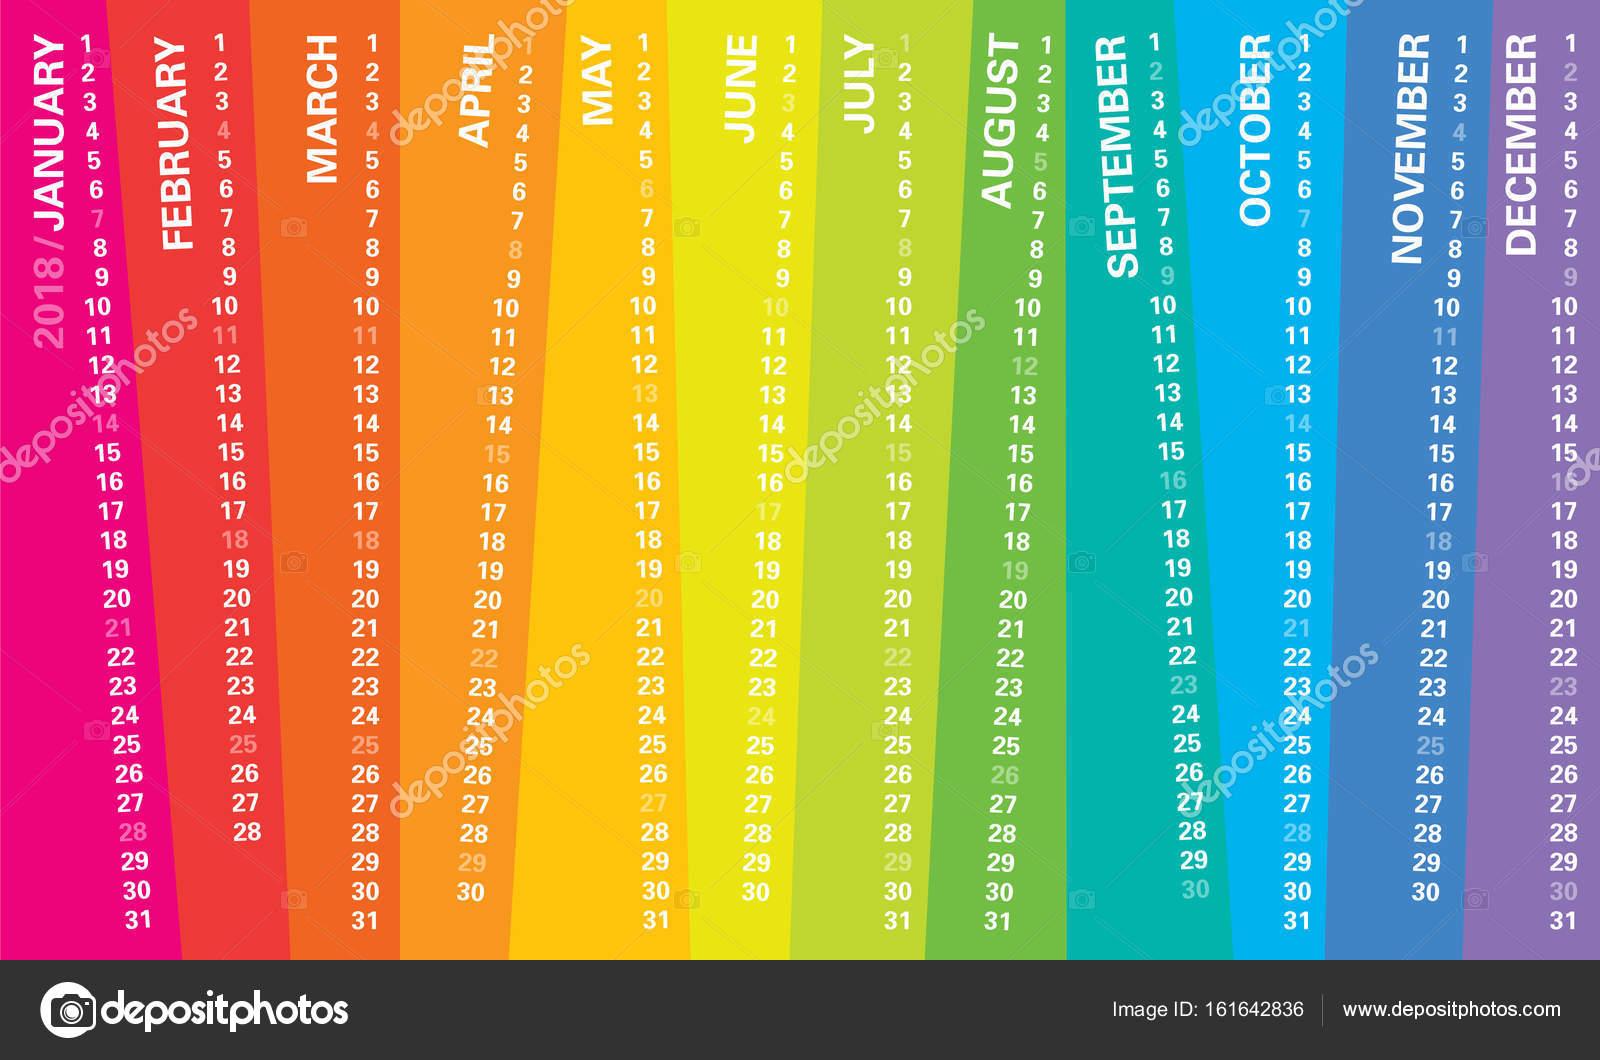 Calendario Rainbow.Calendario Da Parete Creativo 2018 Con Disegno Irregolare